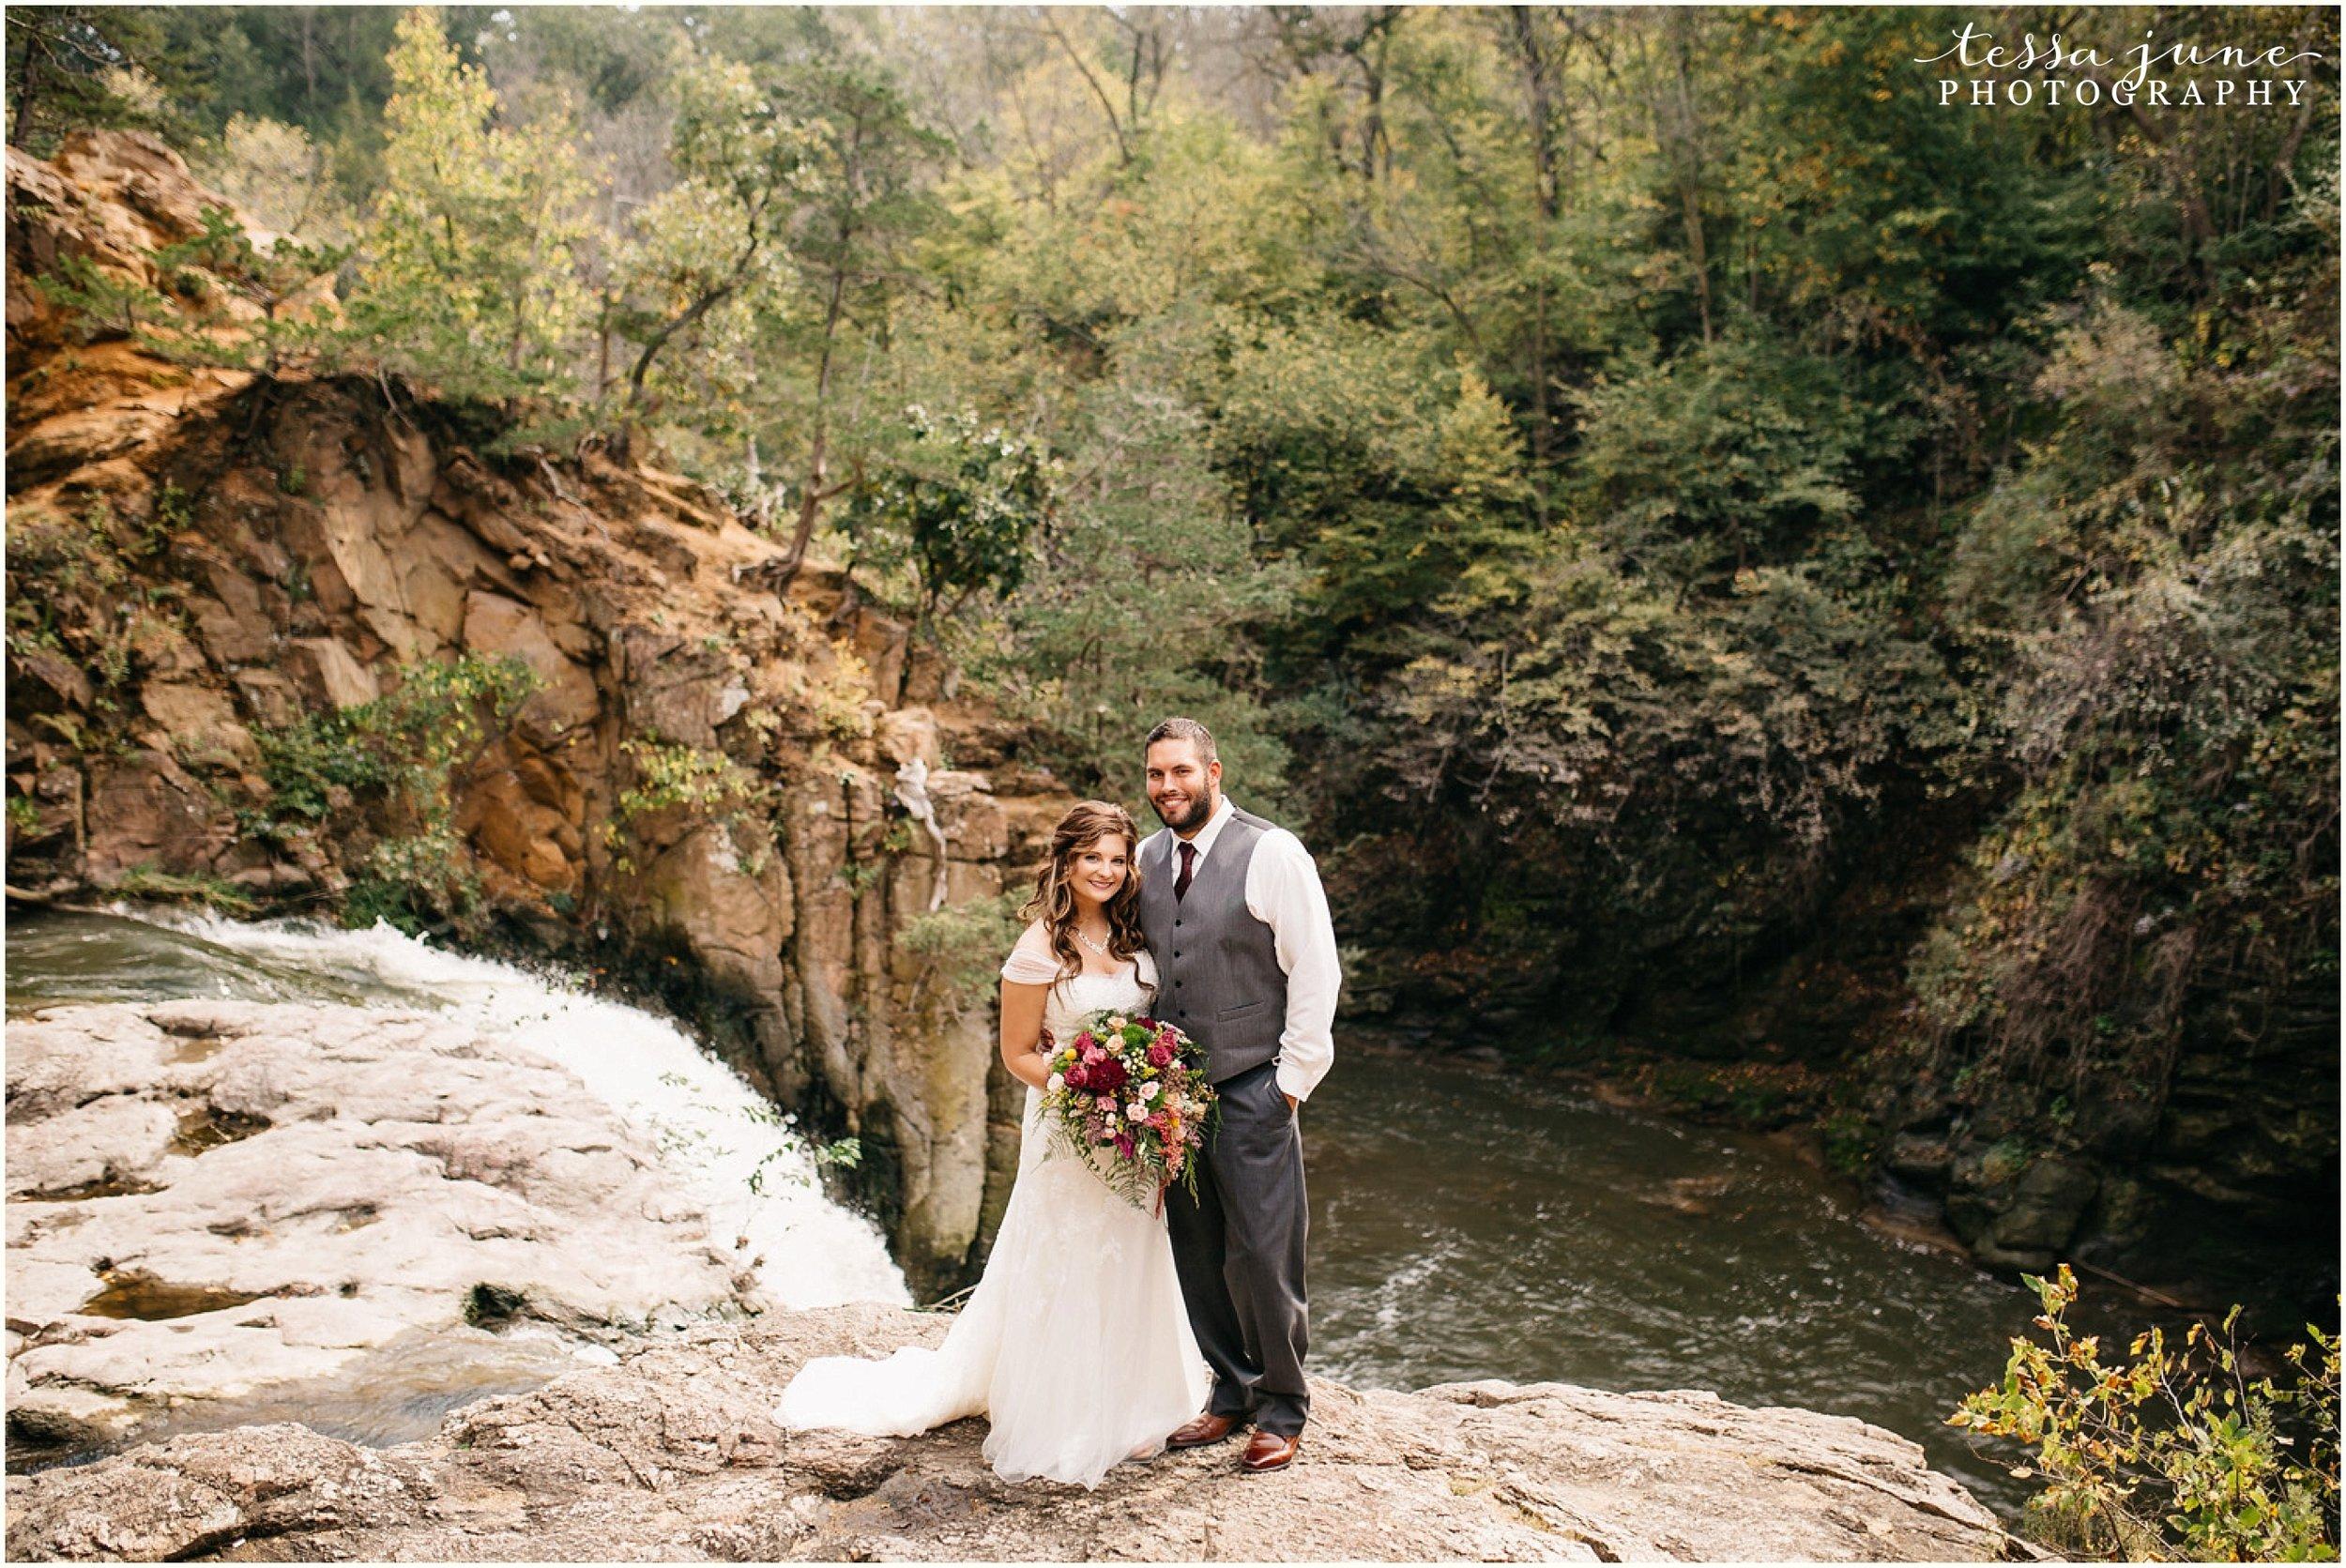 bohemian-minnesota-wedding-mismatched-bridesmaid-dresses-waterfall-st-cloud-tessa-june-photography-61.jpg